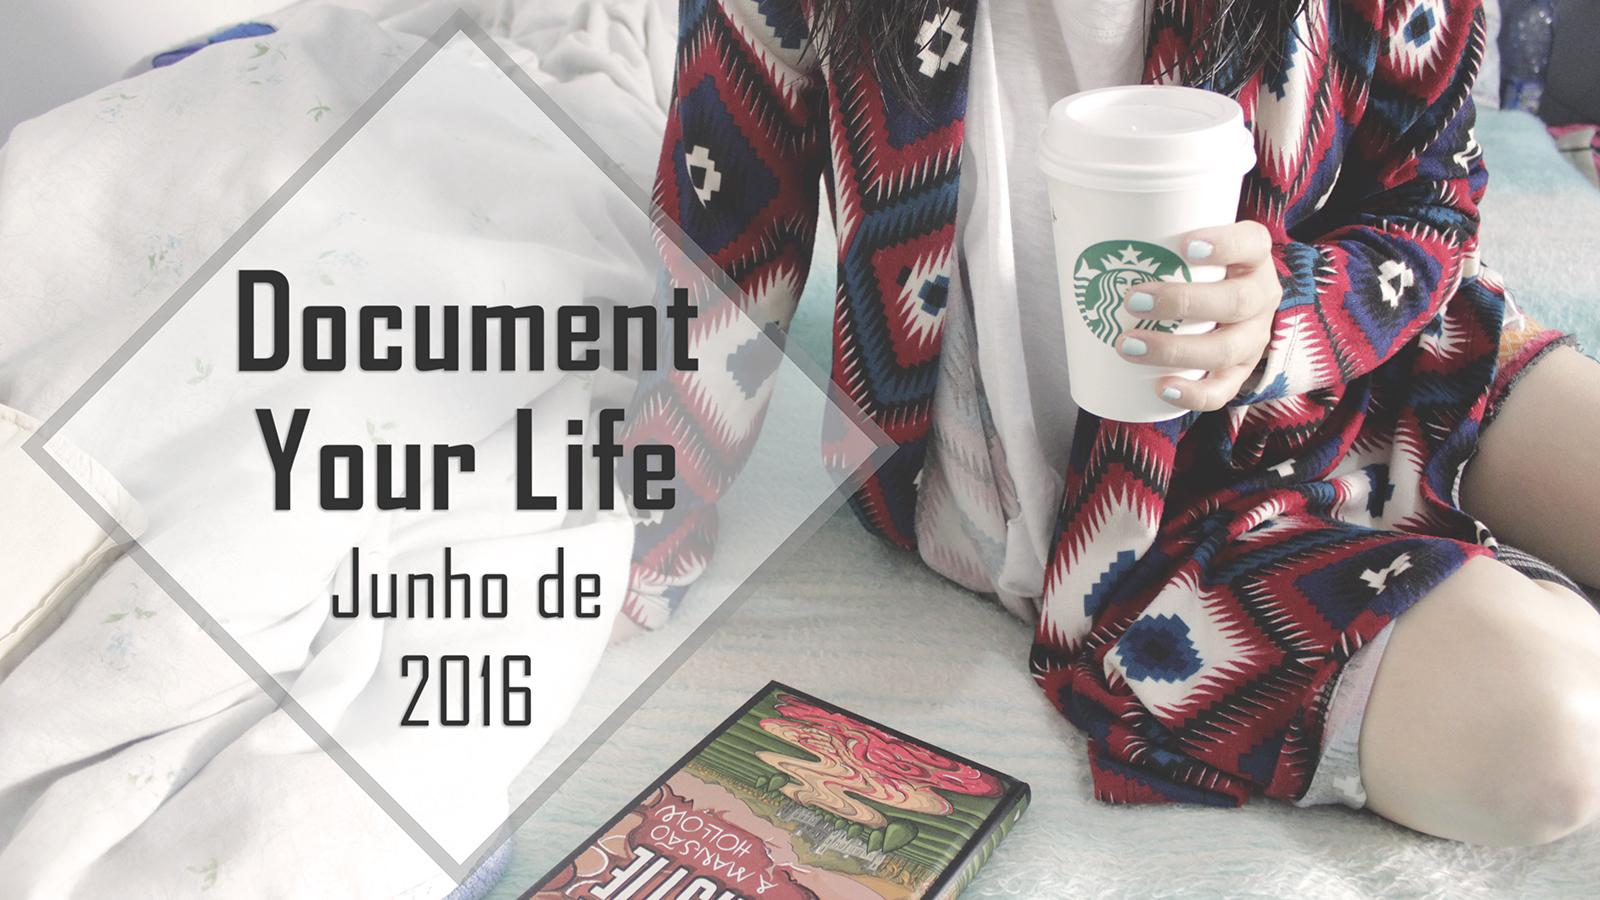 Document Your Life Junho/16